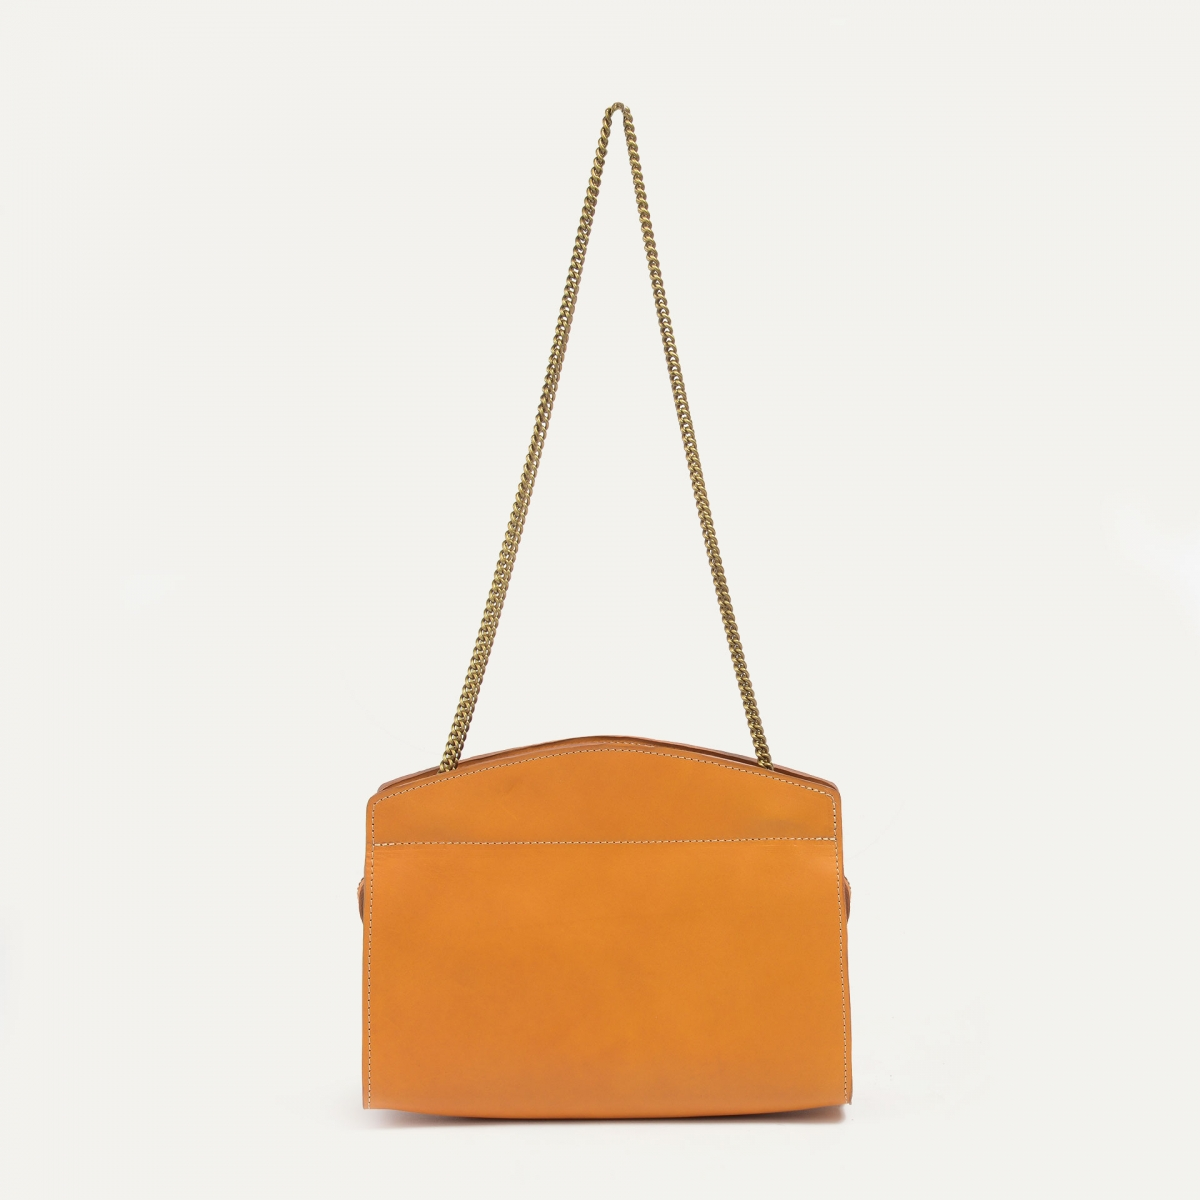 Origami S Zipped clutch bag - Honey (image n°1)